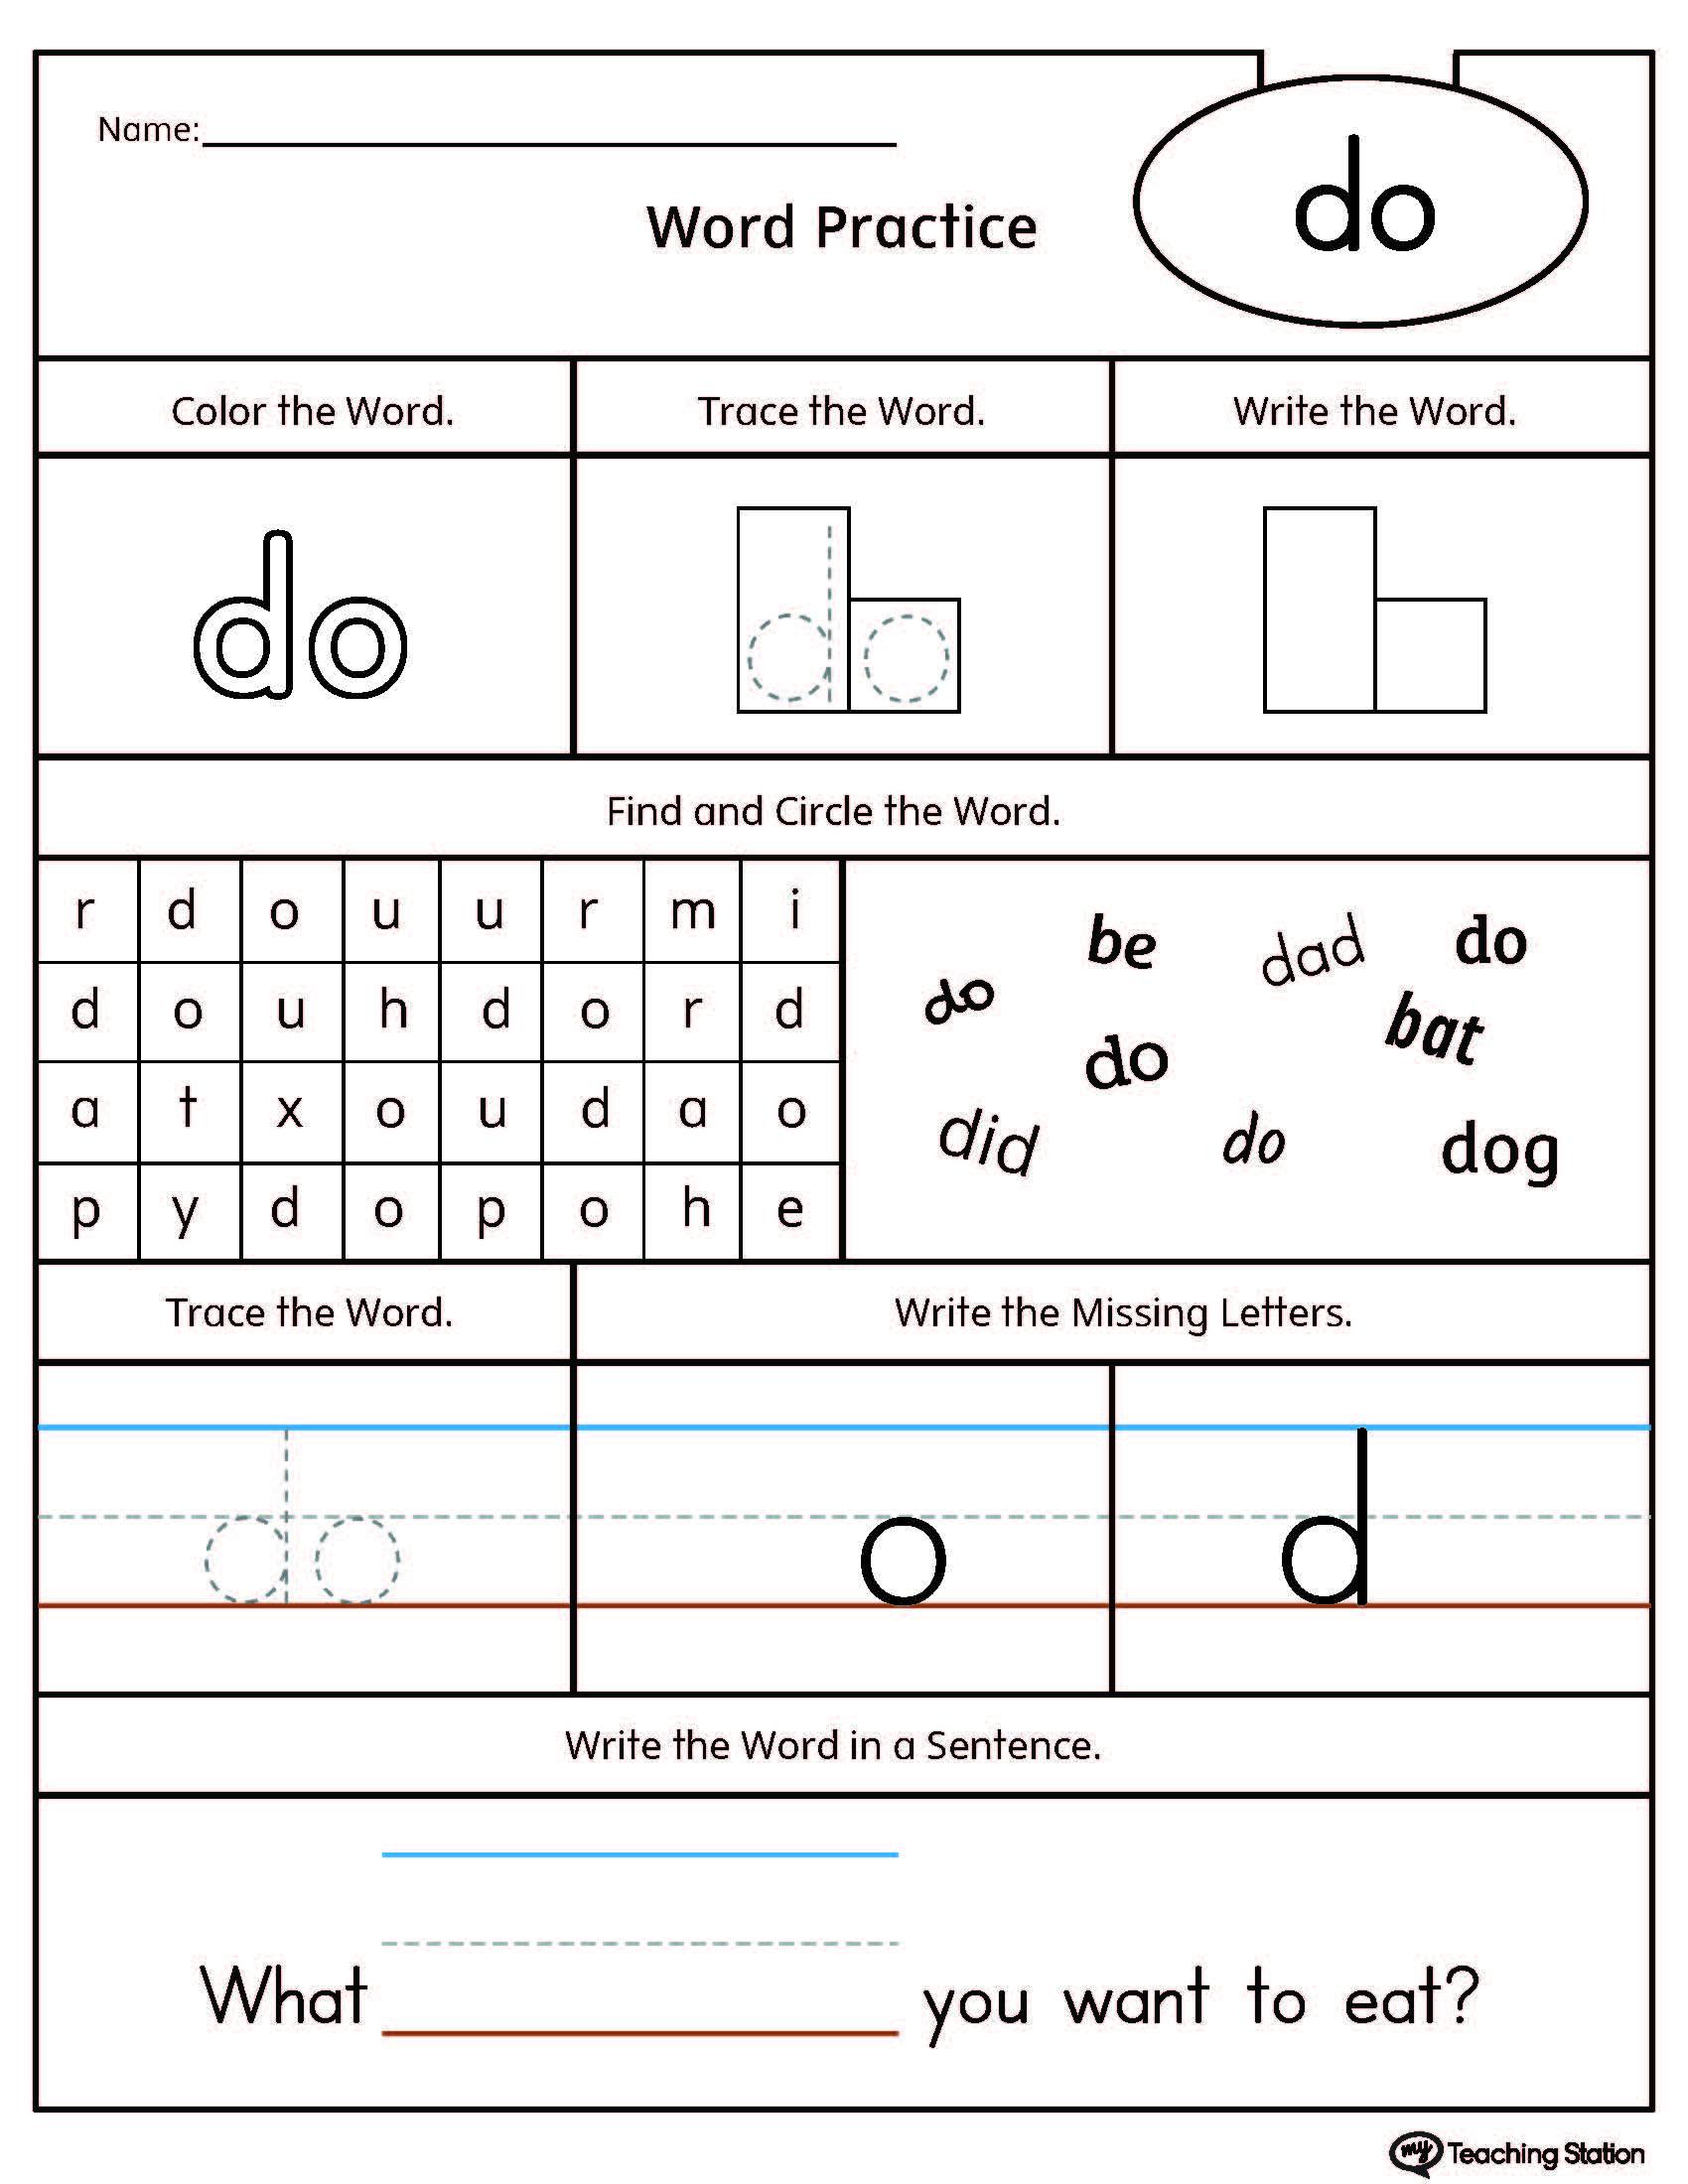 High-Frequency Word Do Printable Worksheet | Myteachingstation | Printable Sight Word Worksheets